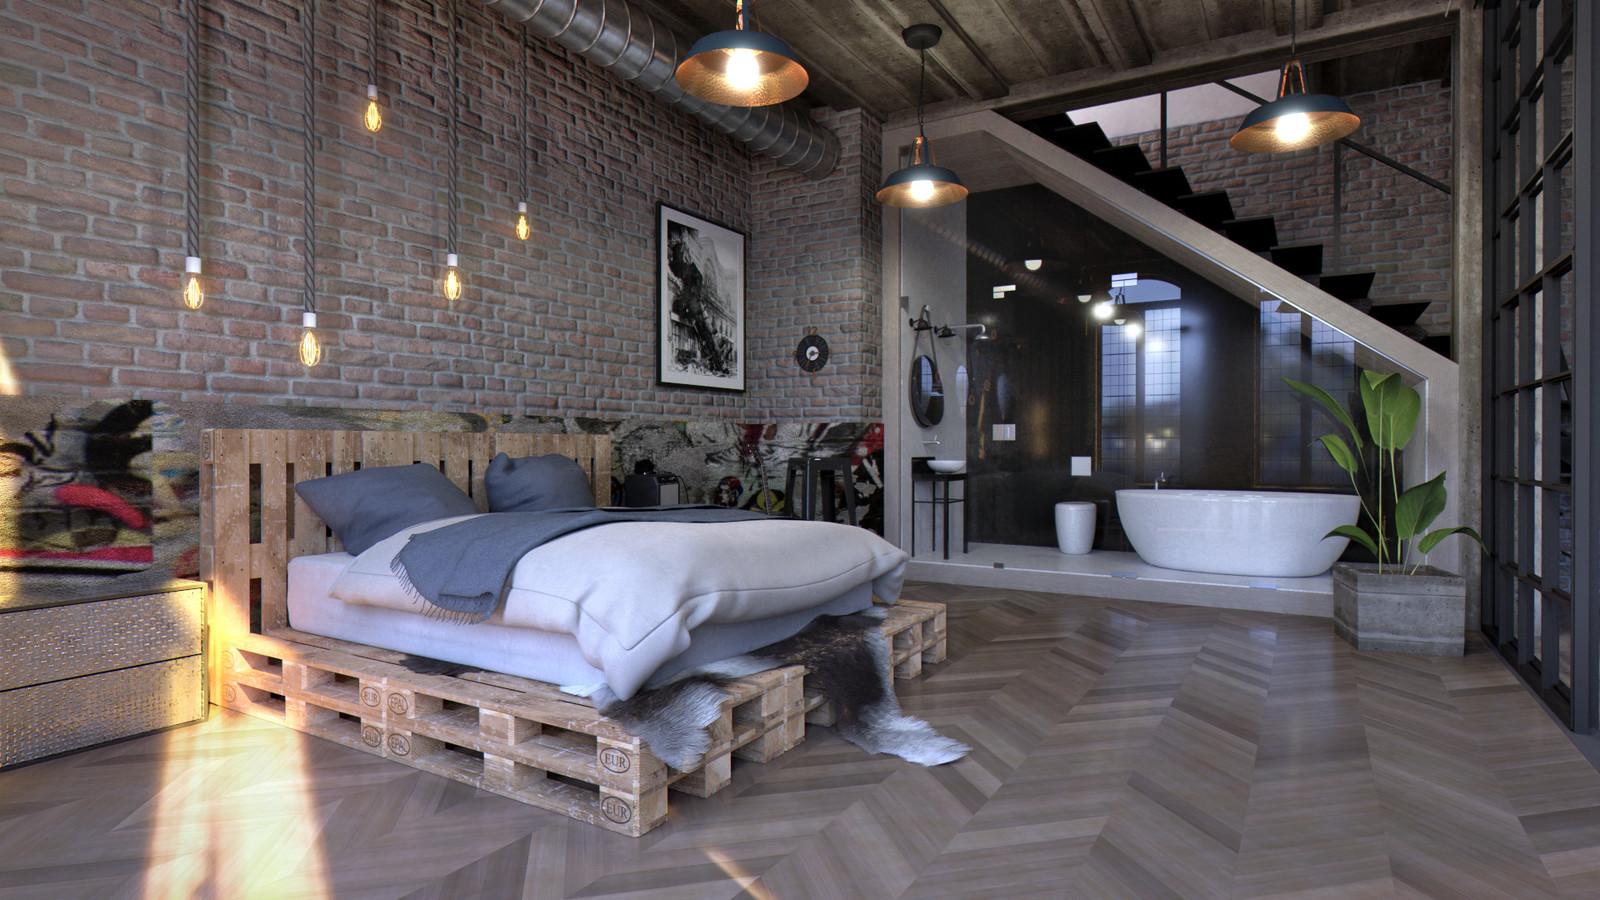 a rock musician's loft bedroom